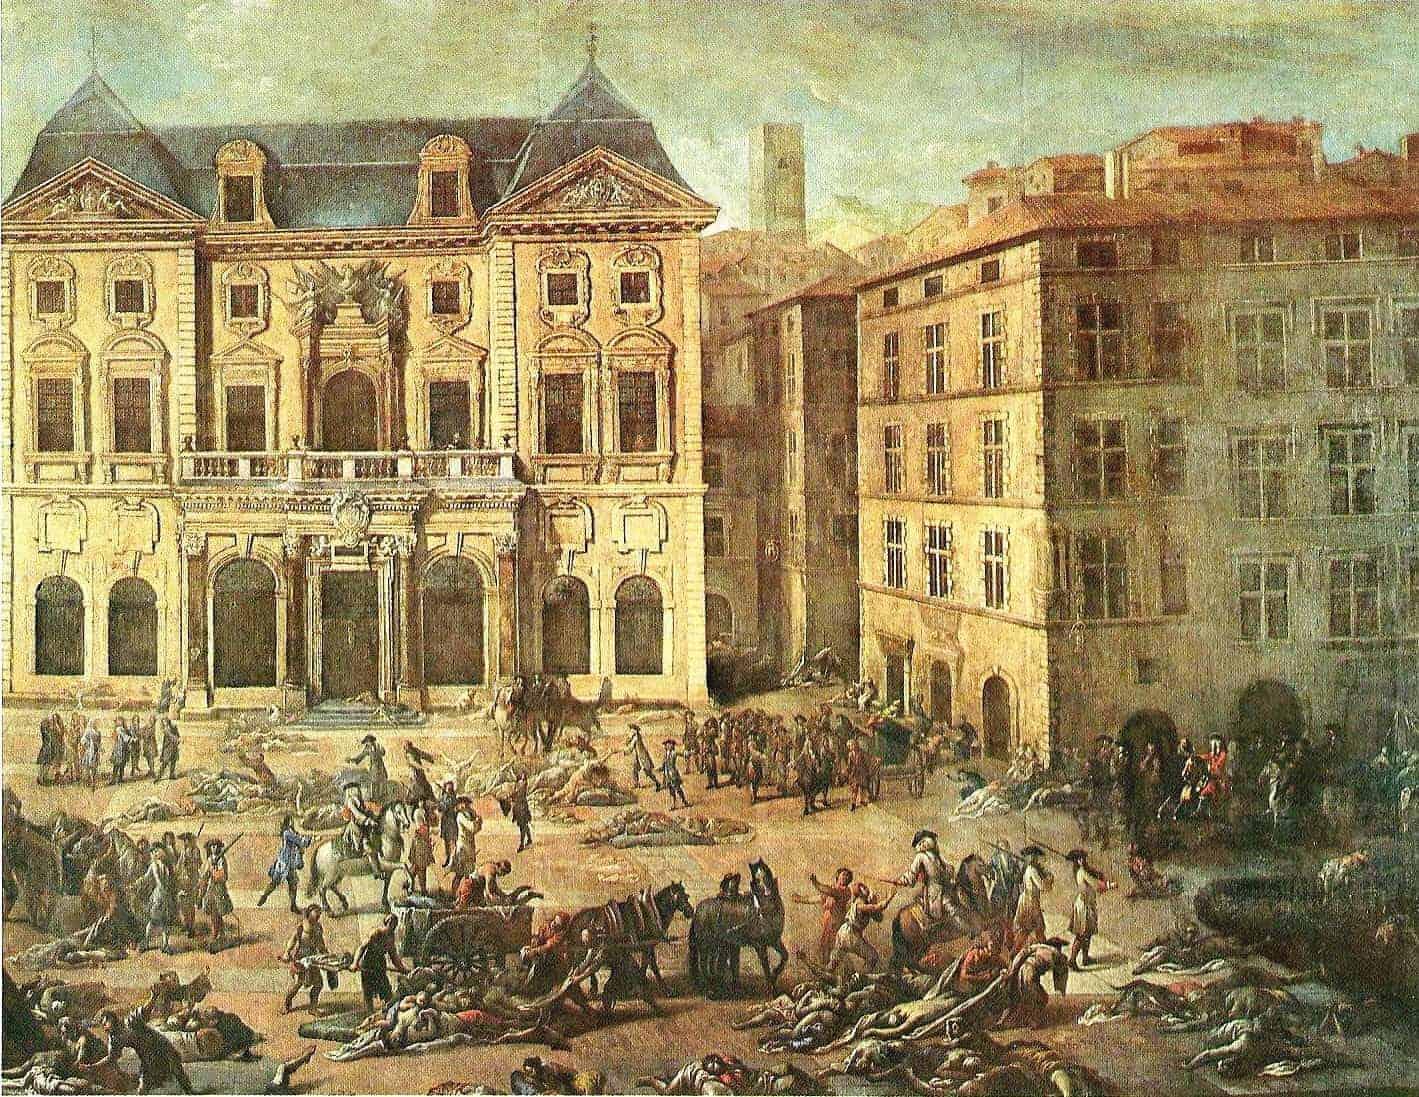 peste-mairie-grand-saint-antoine